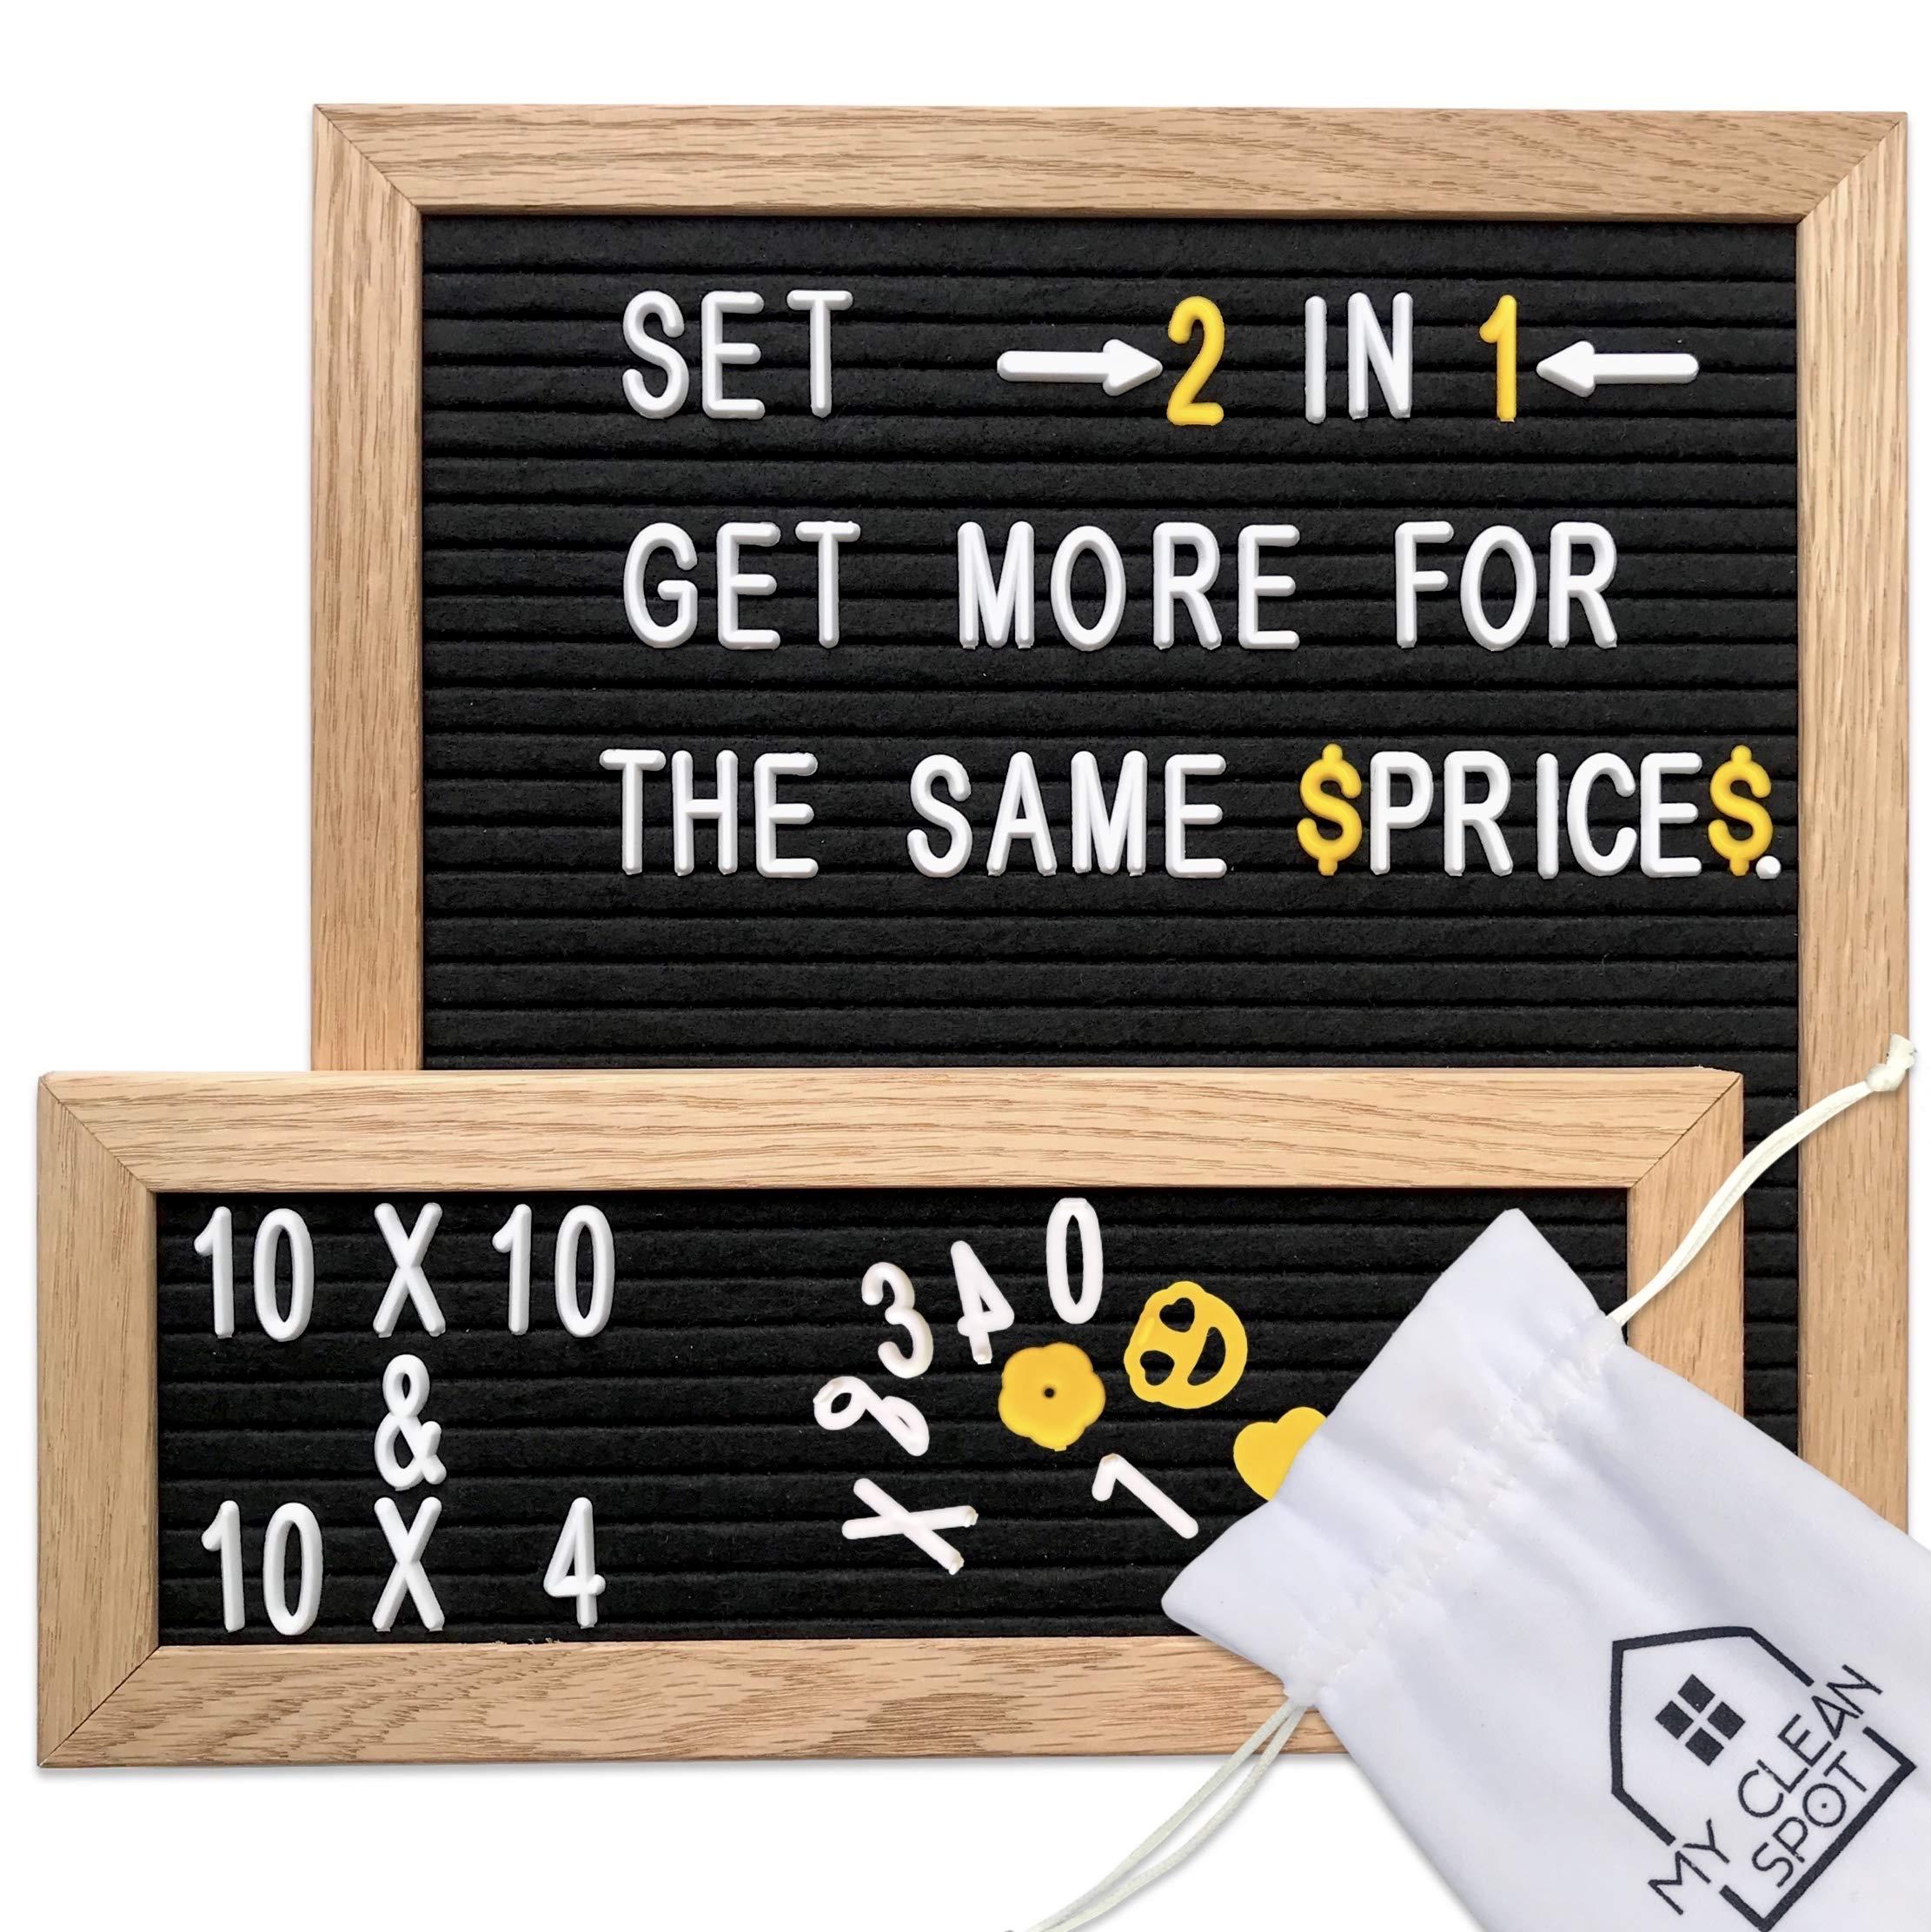 MCS Felt Letter Board Set | 2 Oak Frames- 10x10 + 10 x 4 inch | 680 Changeable Letters, Numbers+Emoji | Organization Accessories - Plastic Storage Organizer, Wood Stand,2 Canvas Bags | Bonus Gift Box